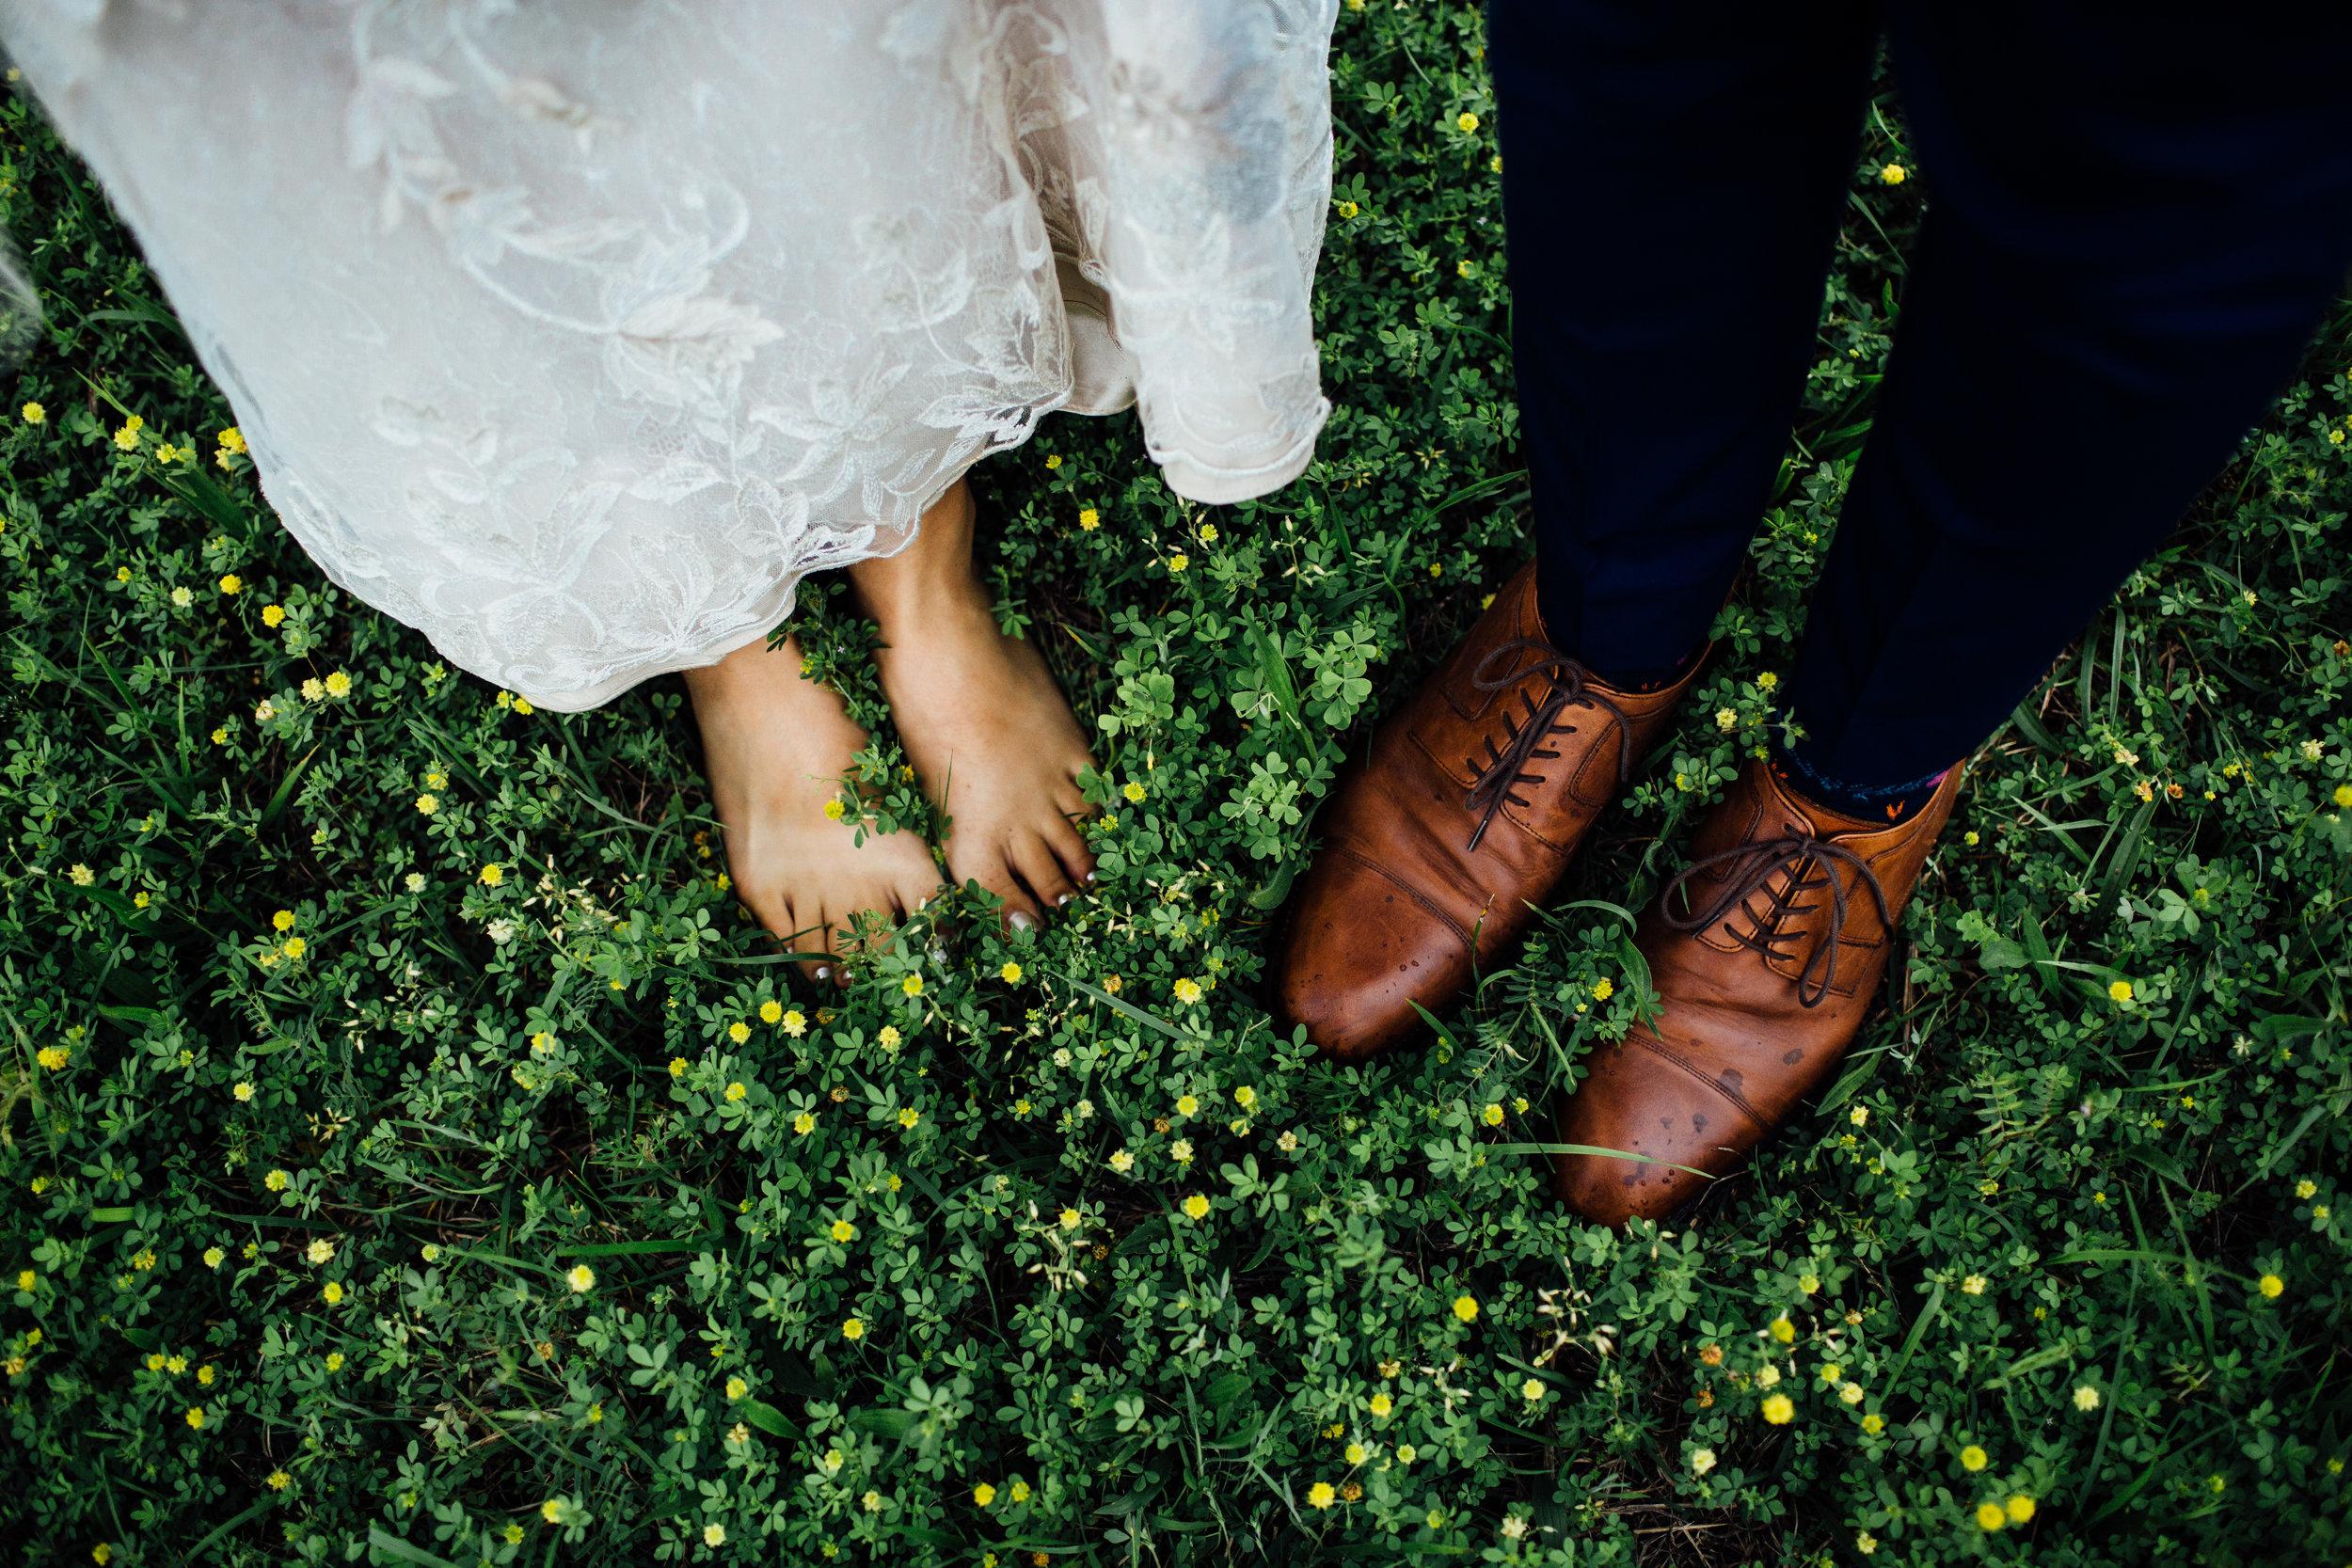 feet in the grass little flowers